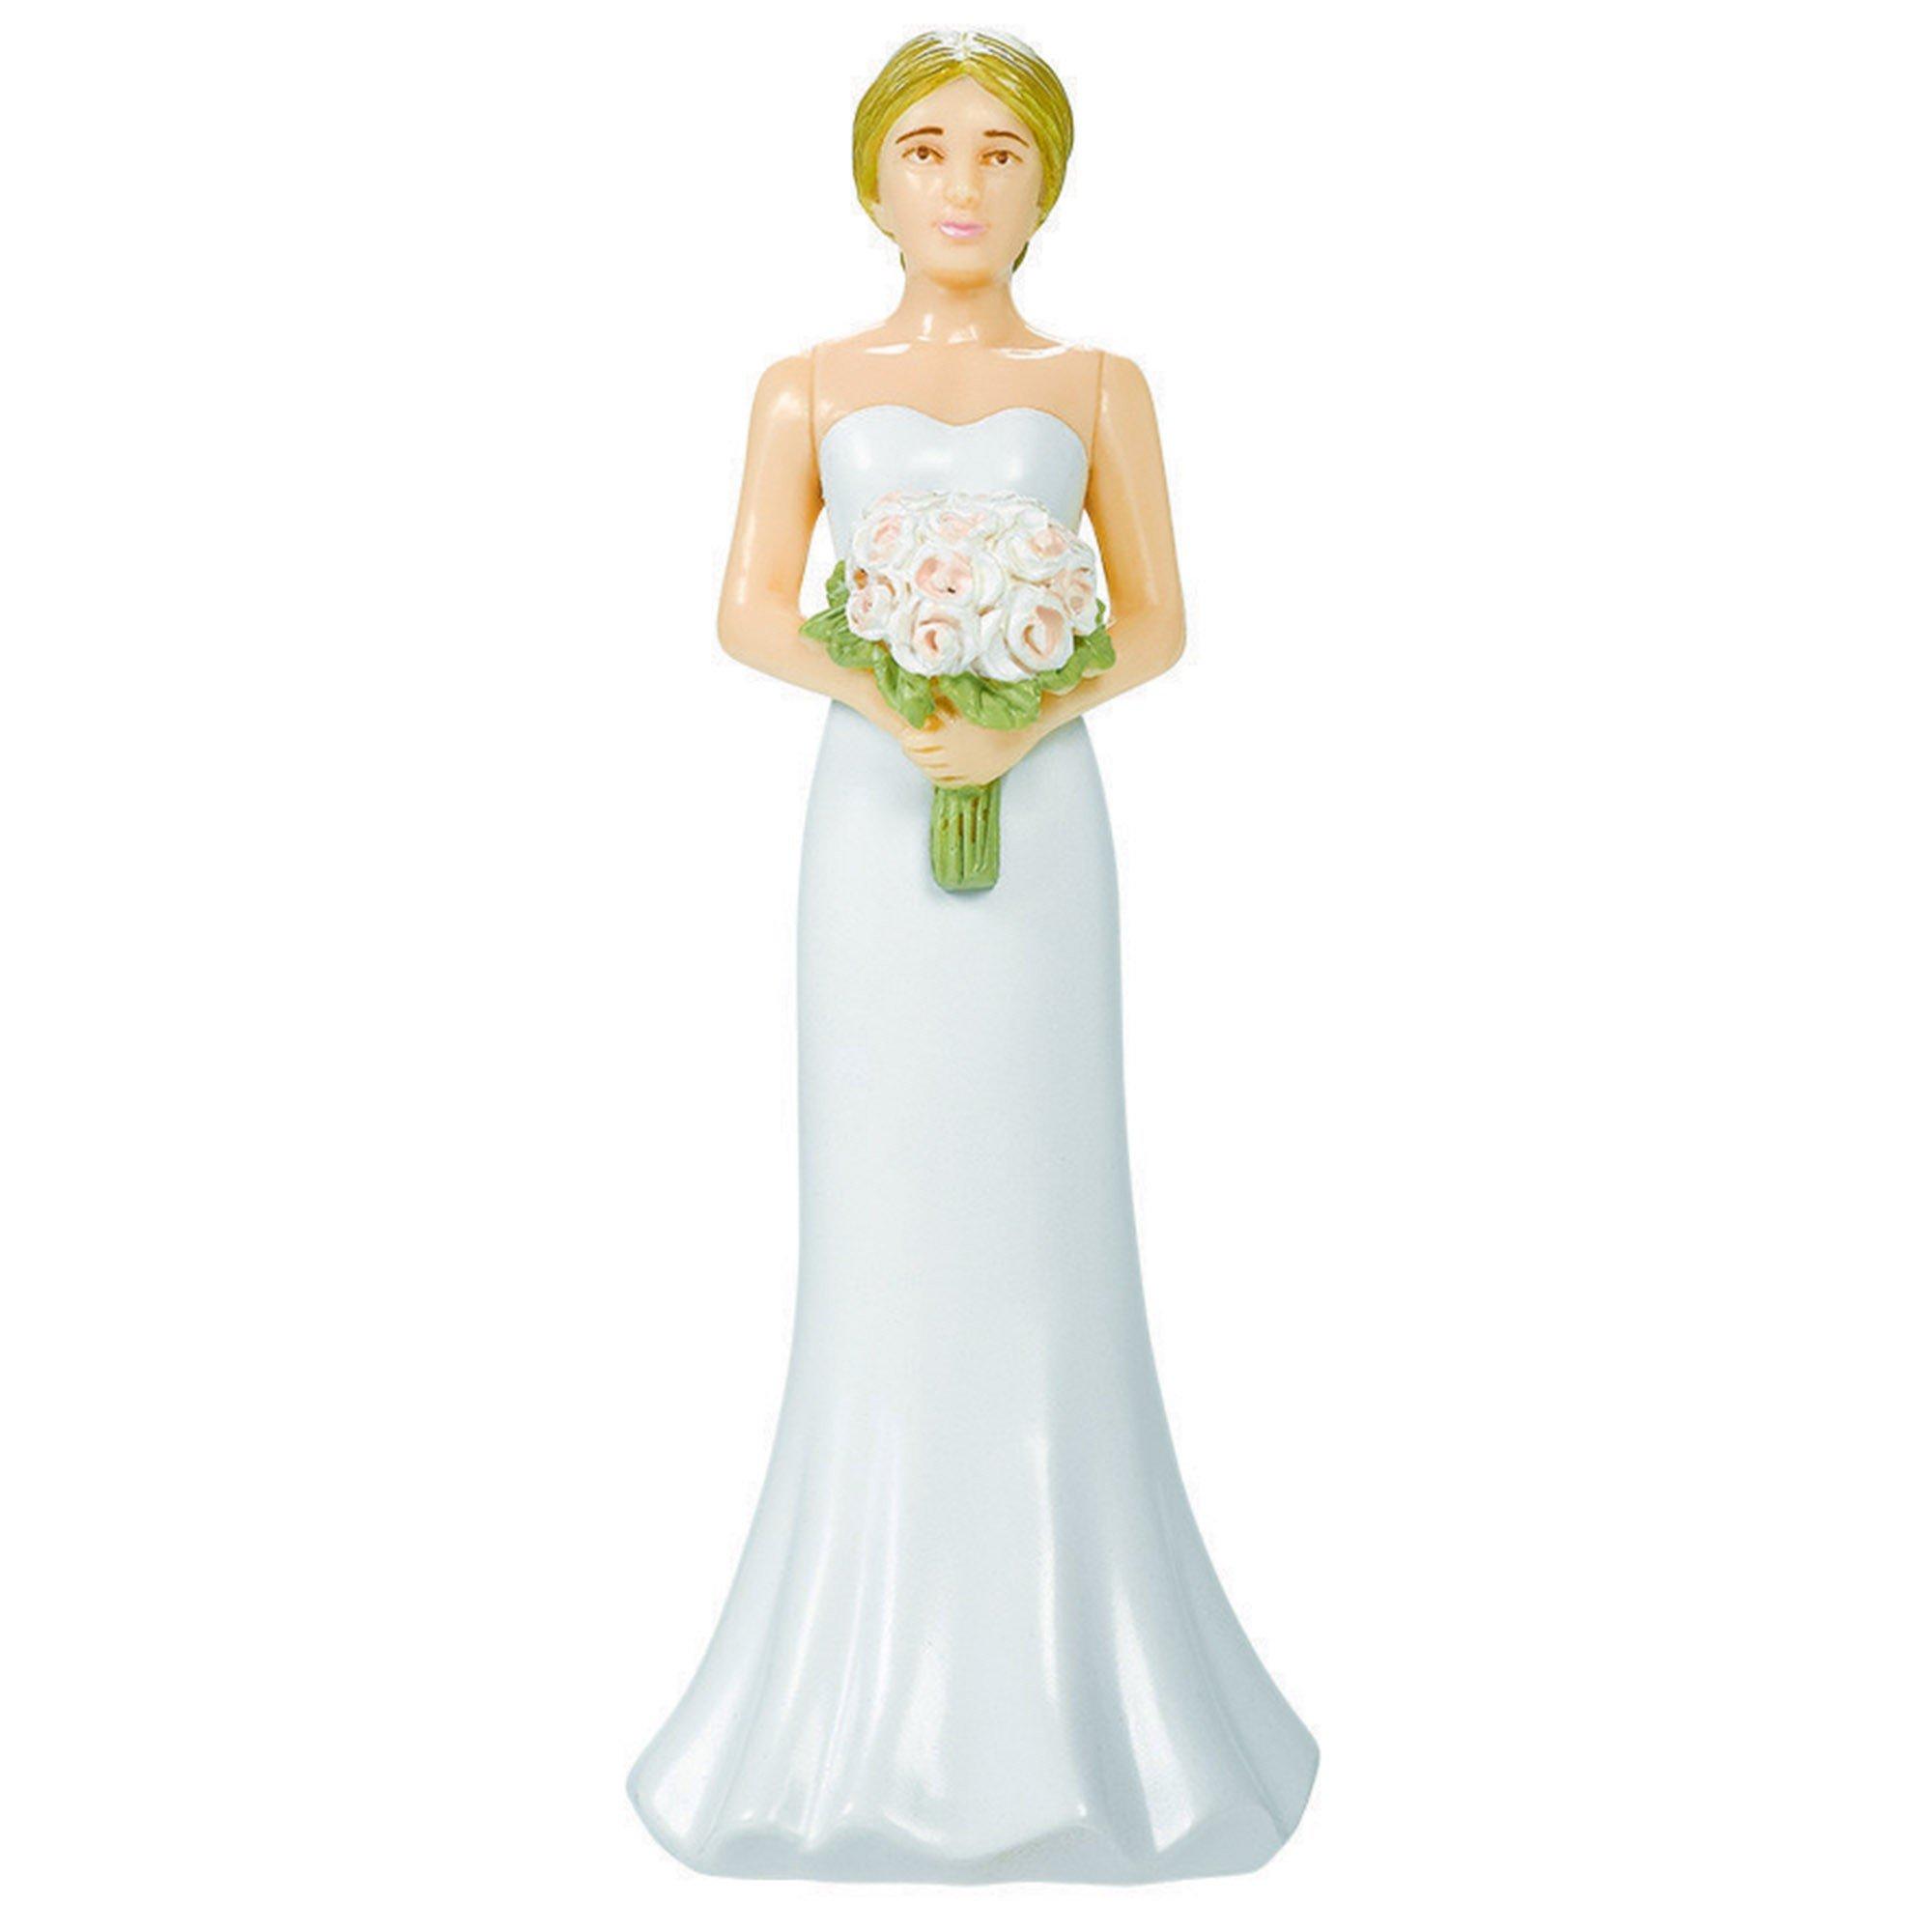 Cake Topper Blonde Hair Bride Plastic